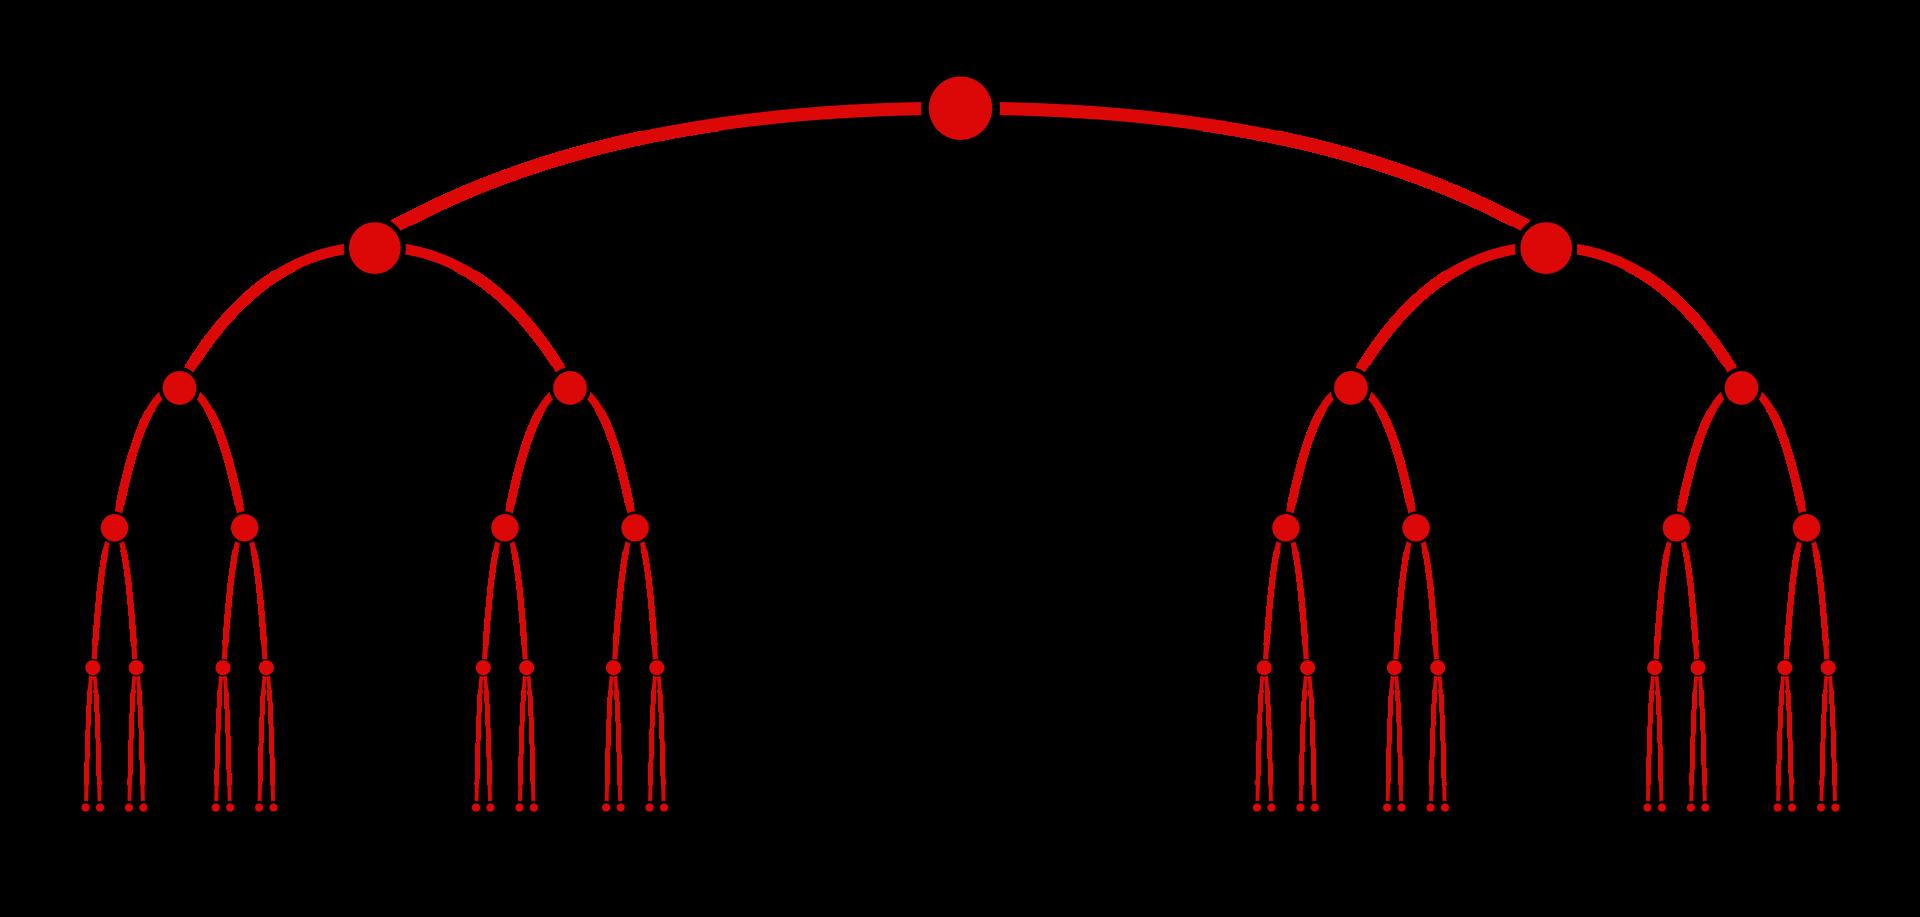 example of nowhere dense set